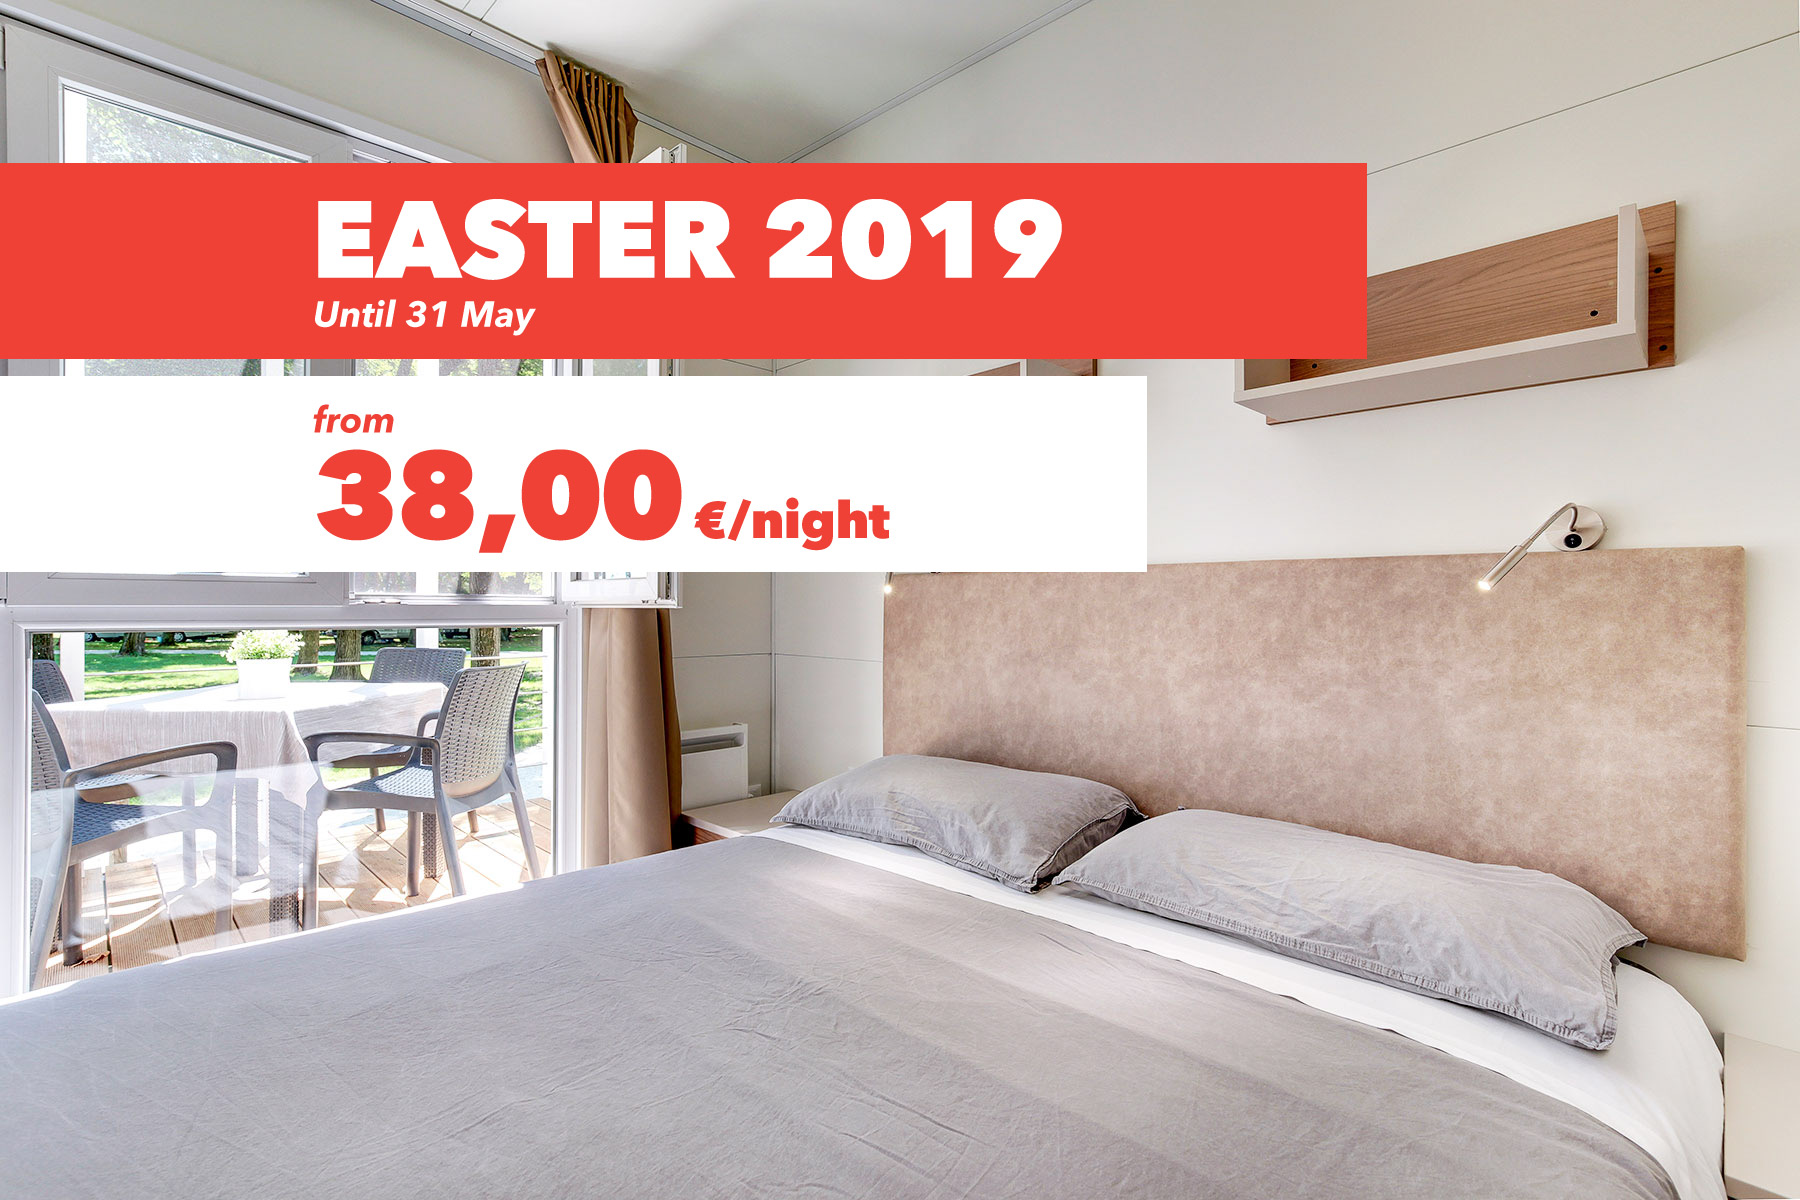 Easter 2019 - Venice